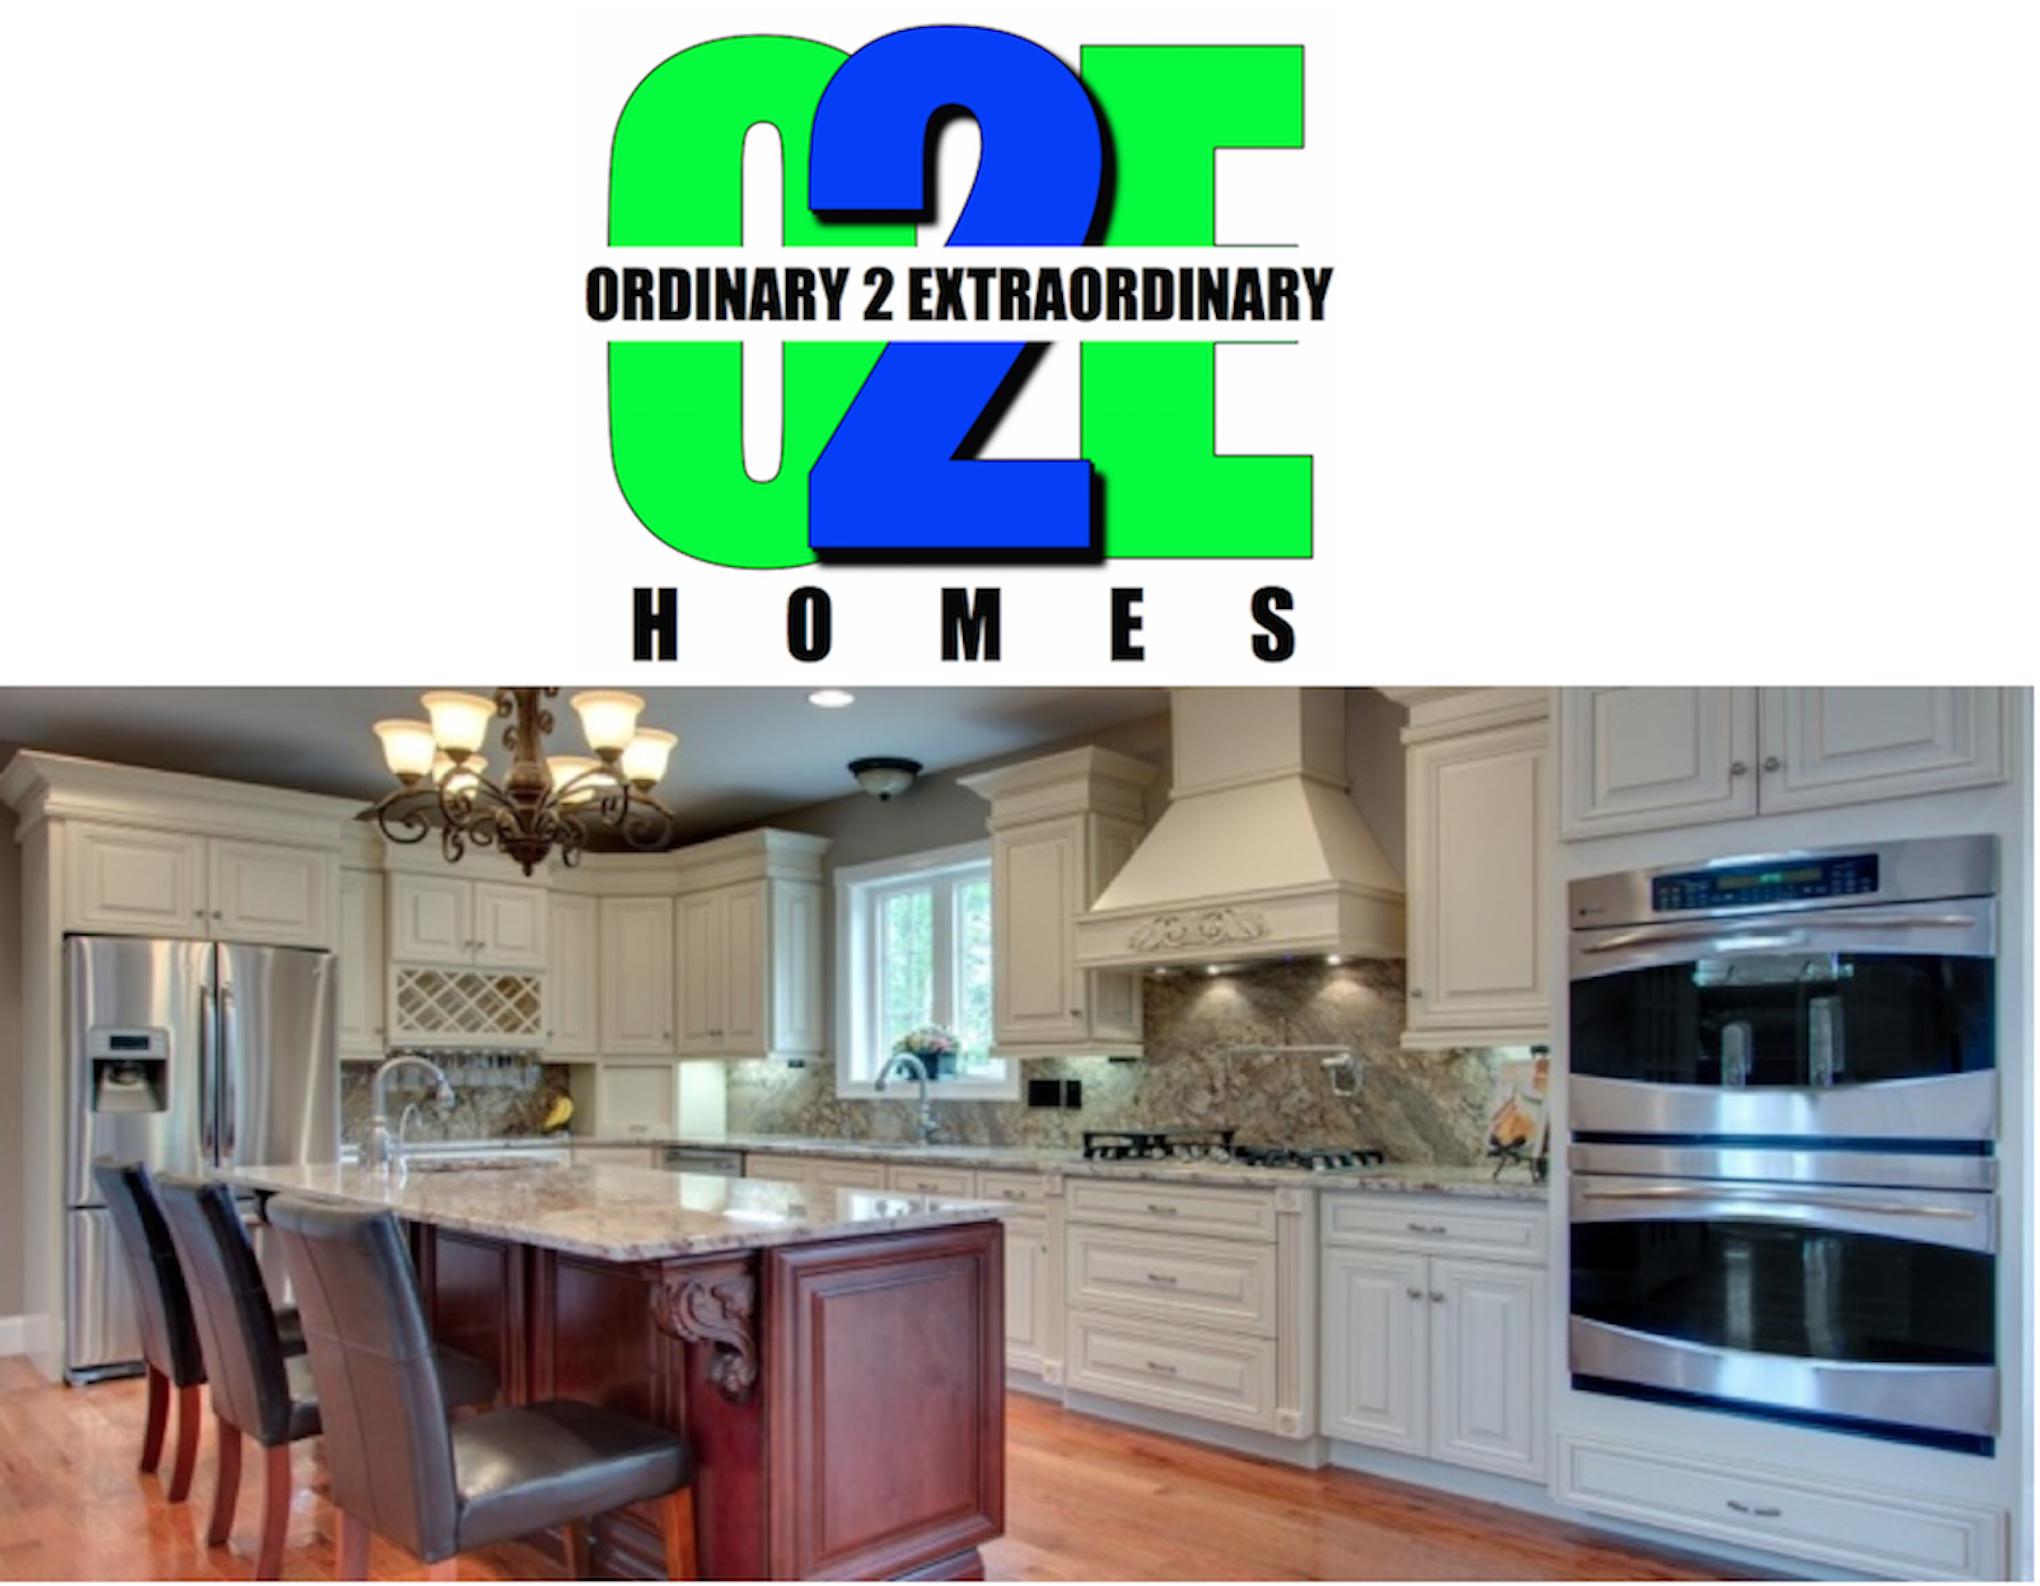 O2e homes kitchen cabinets in ocoee fl 407 487 3 for Cheap kitchen cabinets in orlando fl